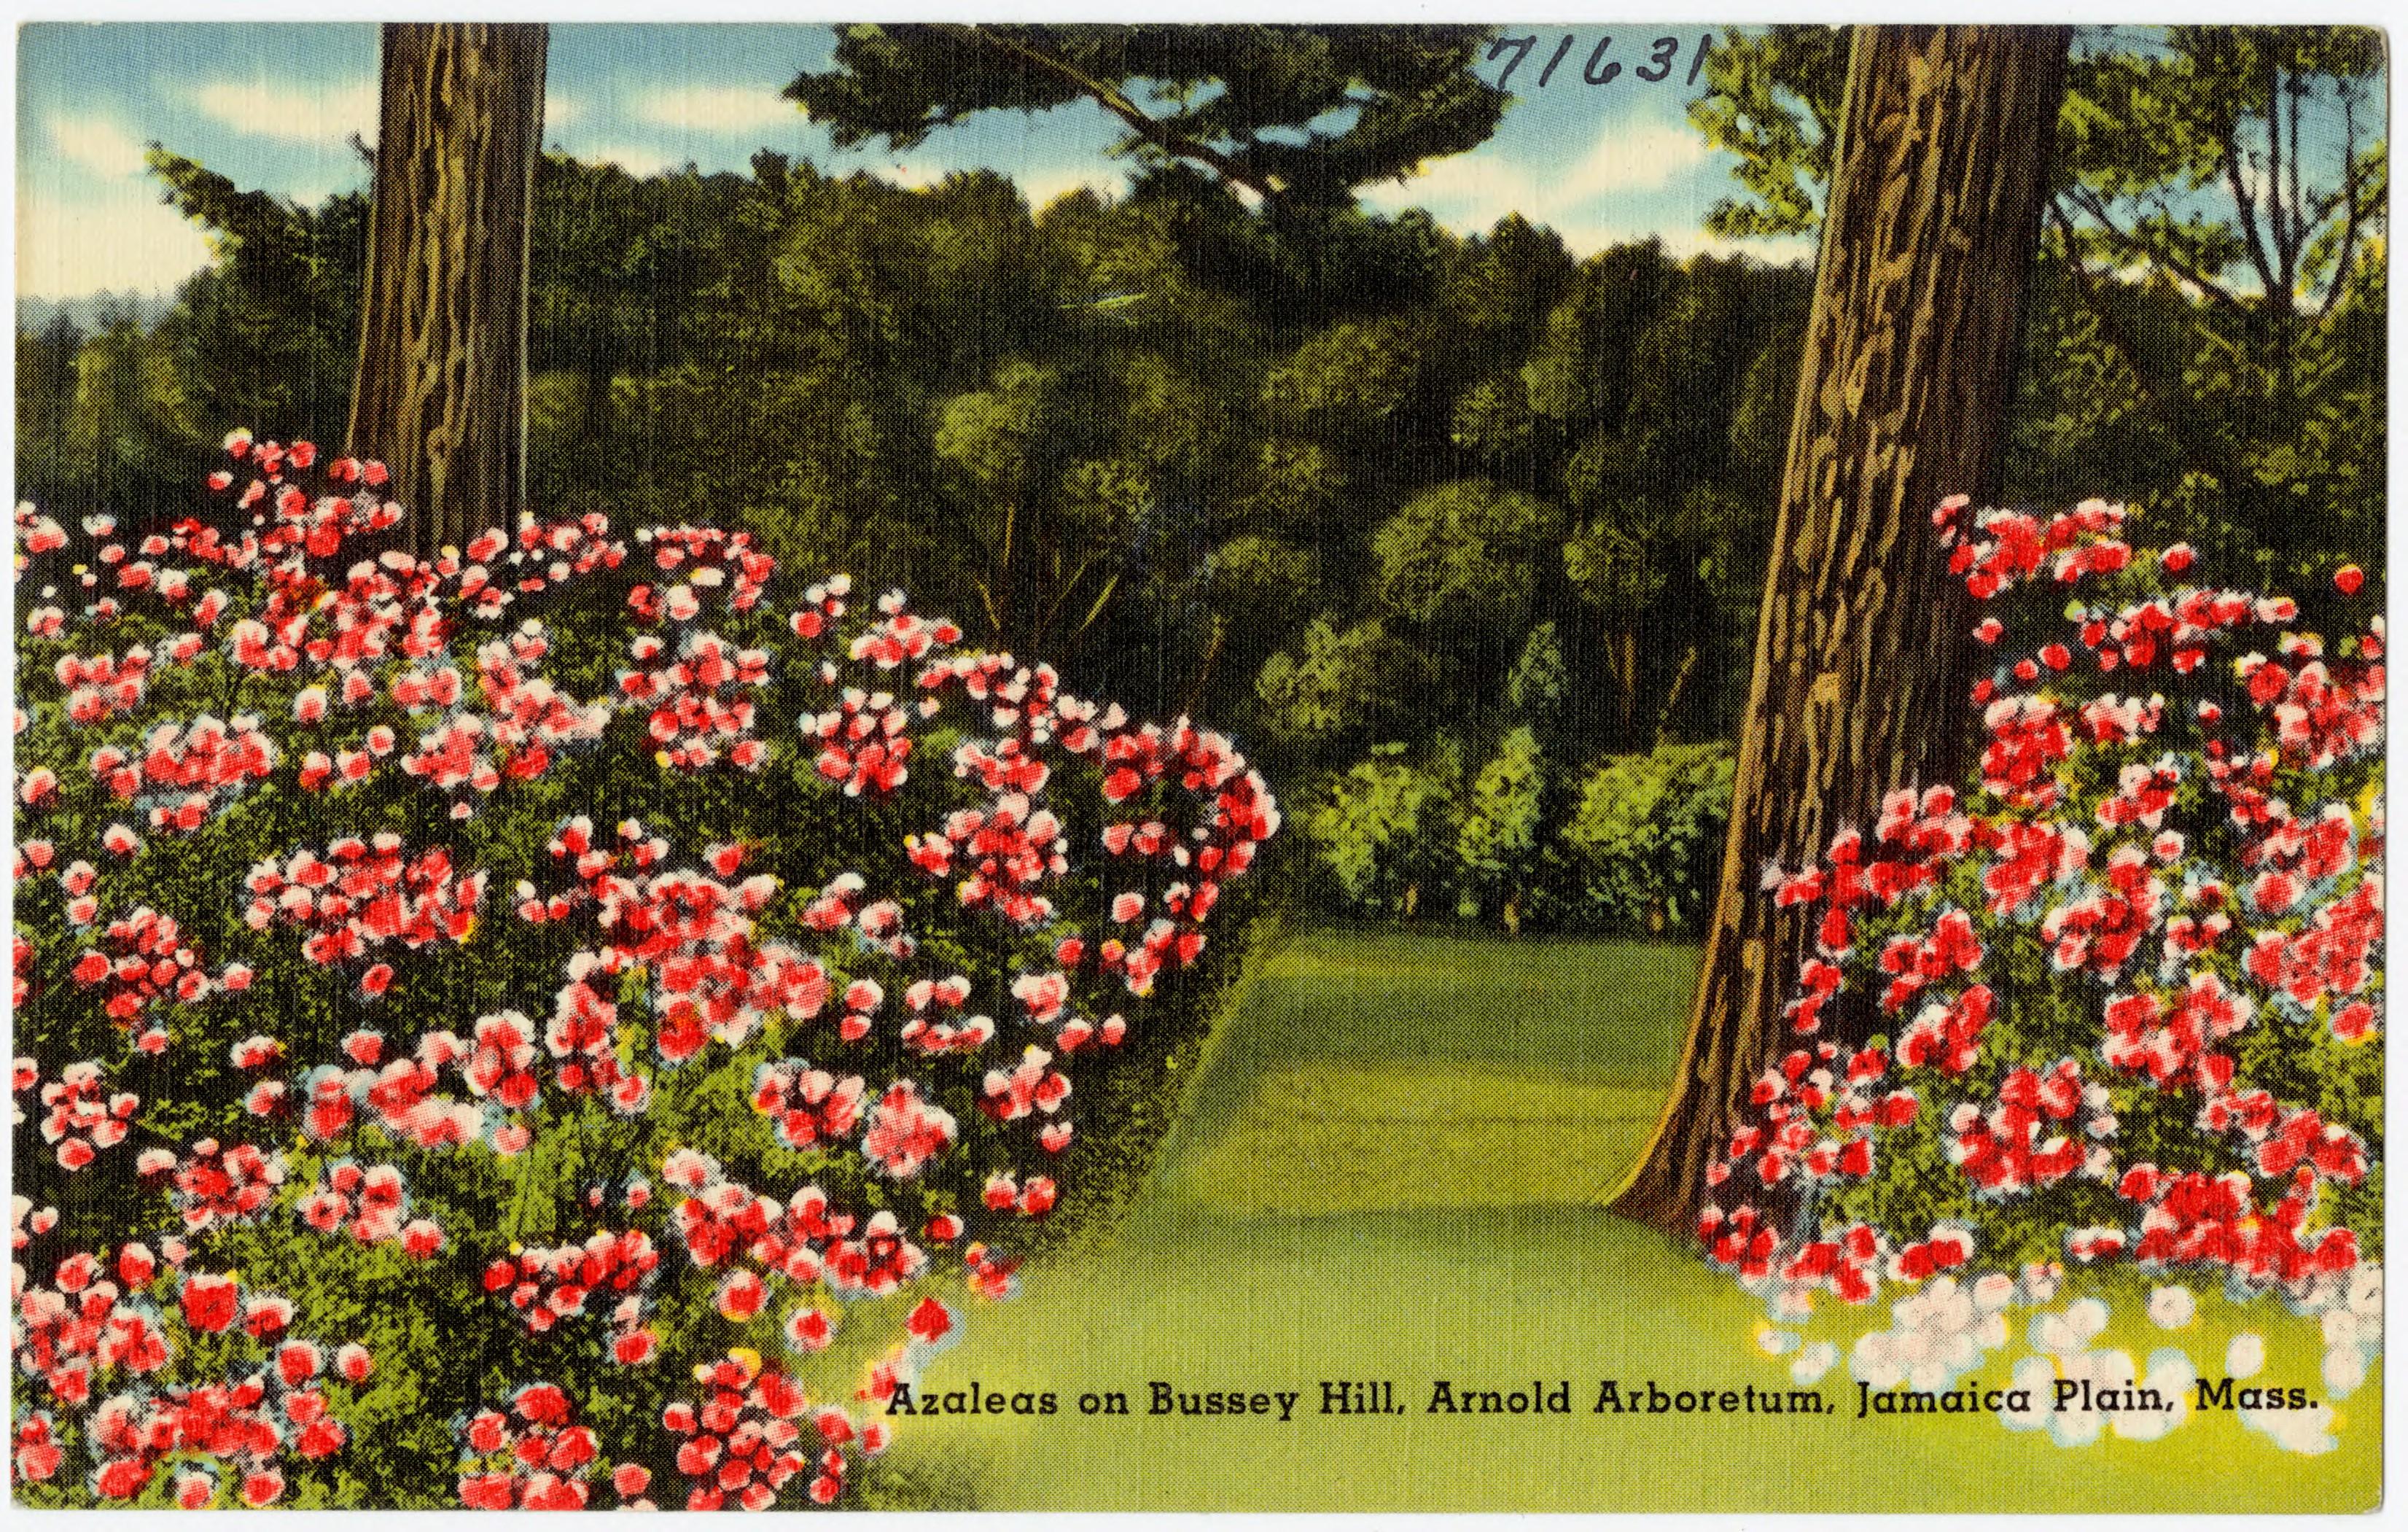 File:Azaleas on Bussey Hill, Arnold Arboretum, Jamaica Plain, Mass ...